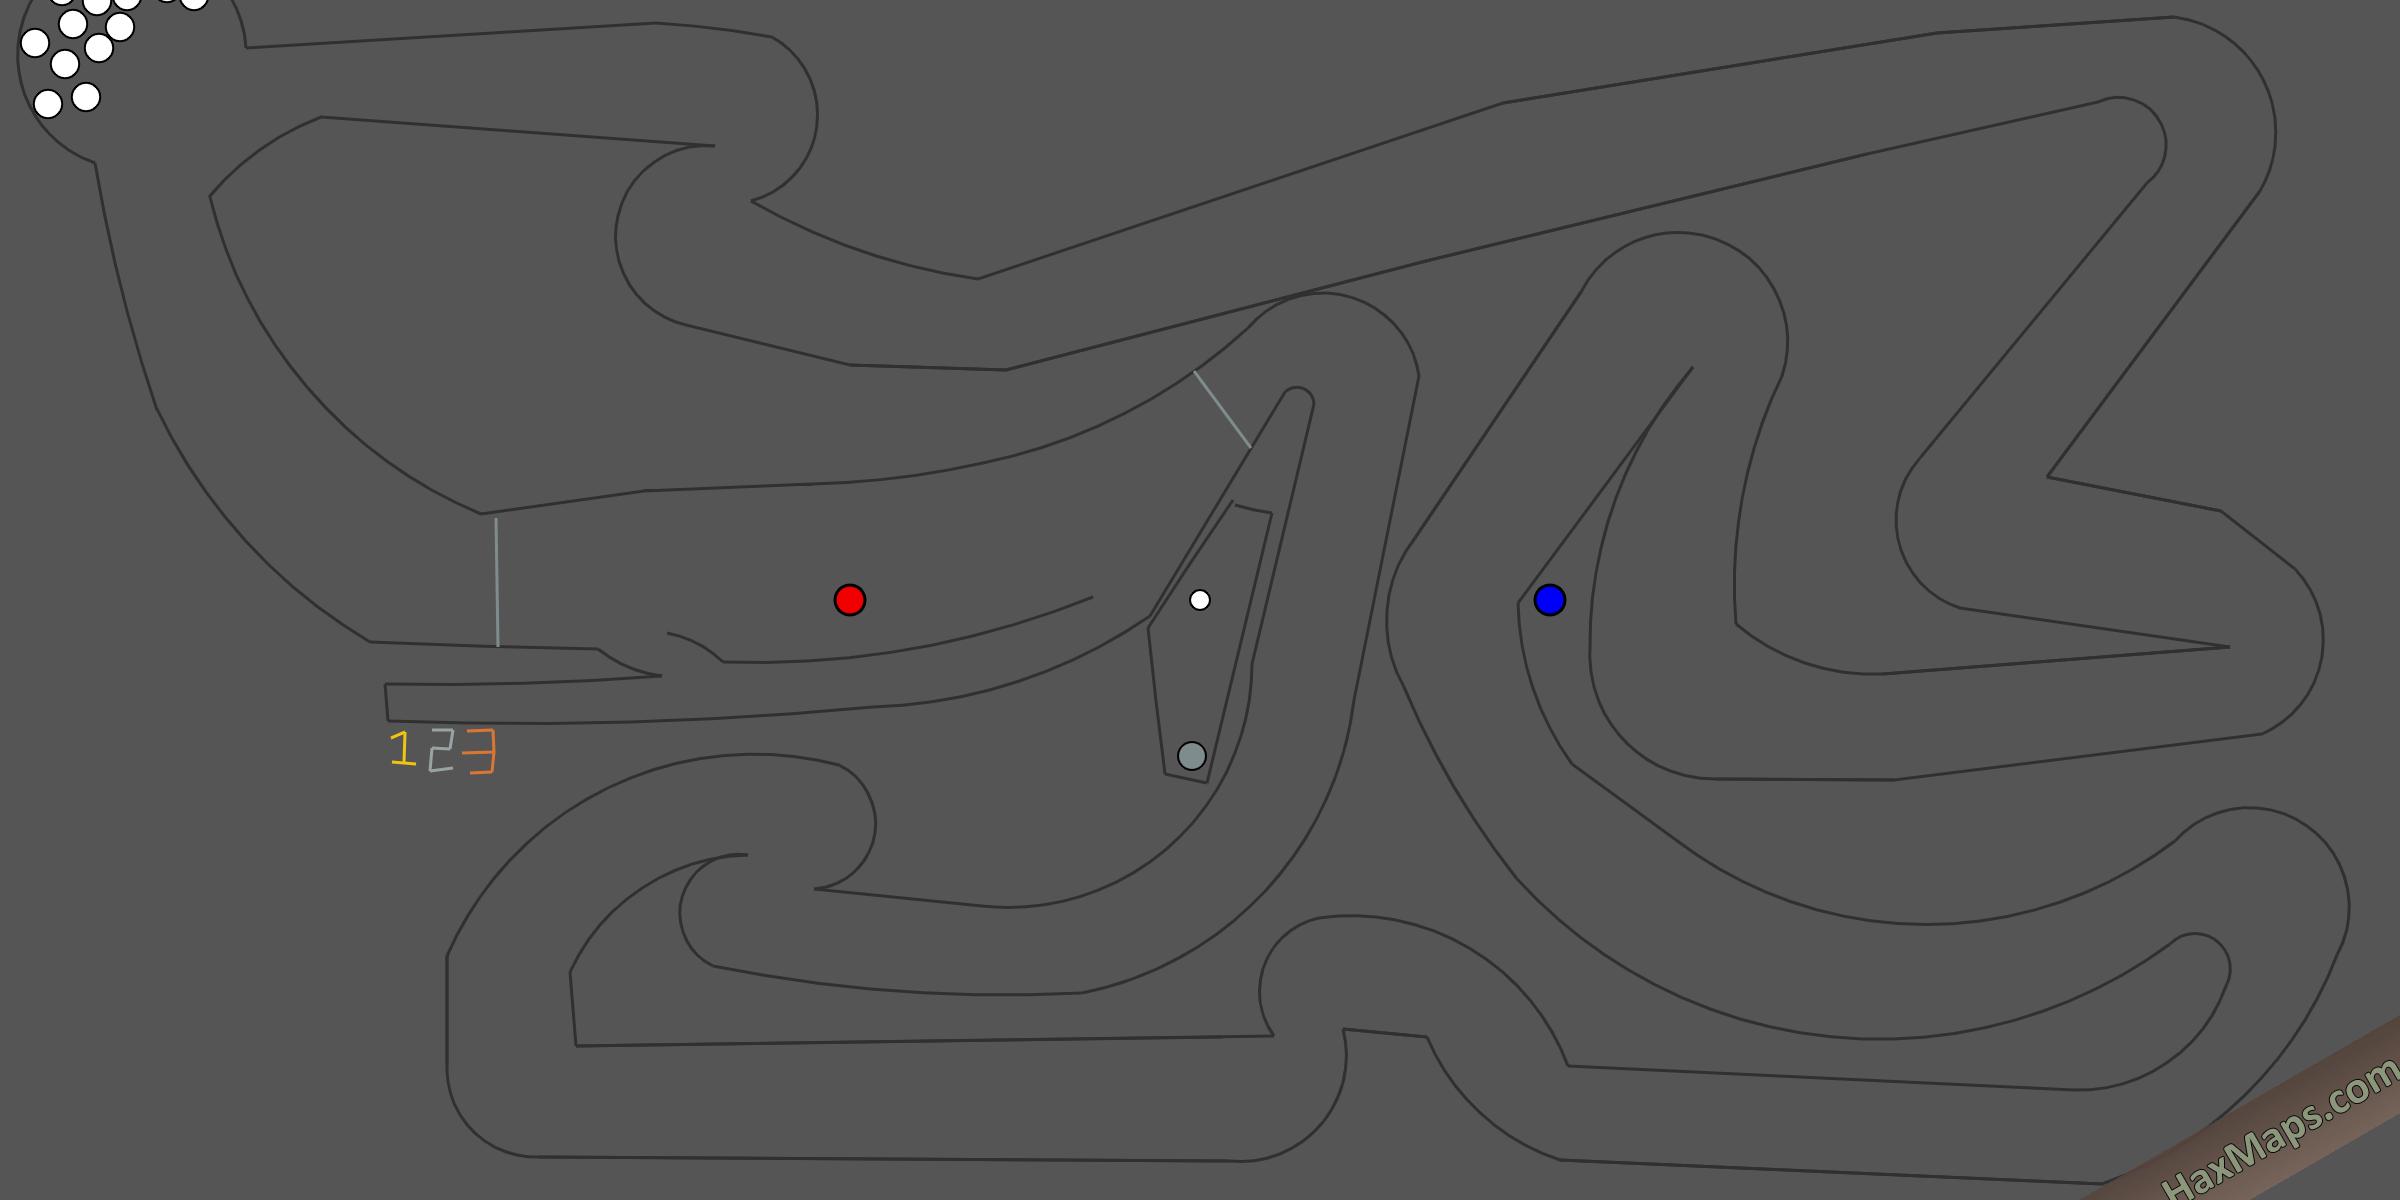 hax ball maps | HaxRacing Ephemeris Track